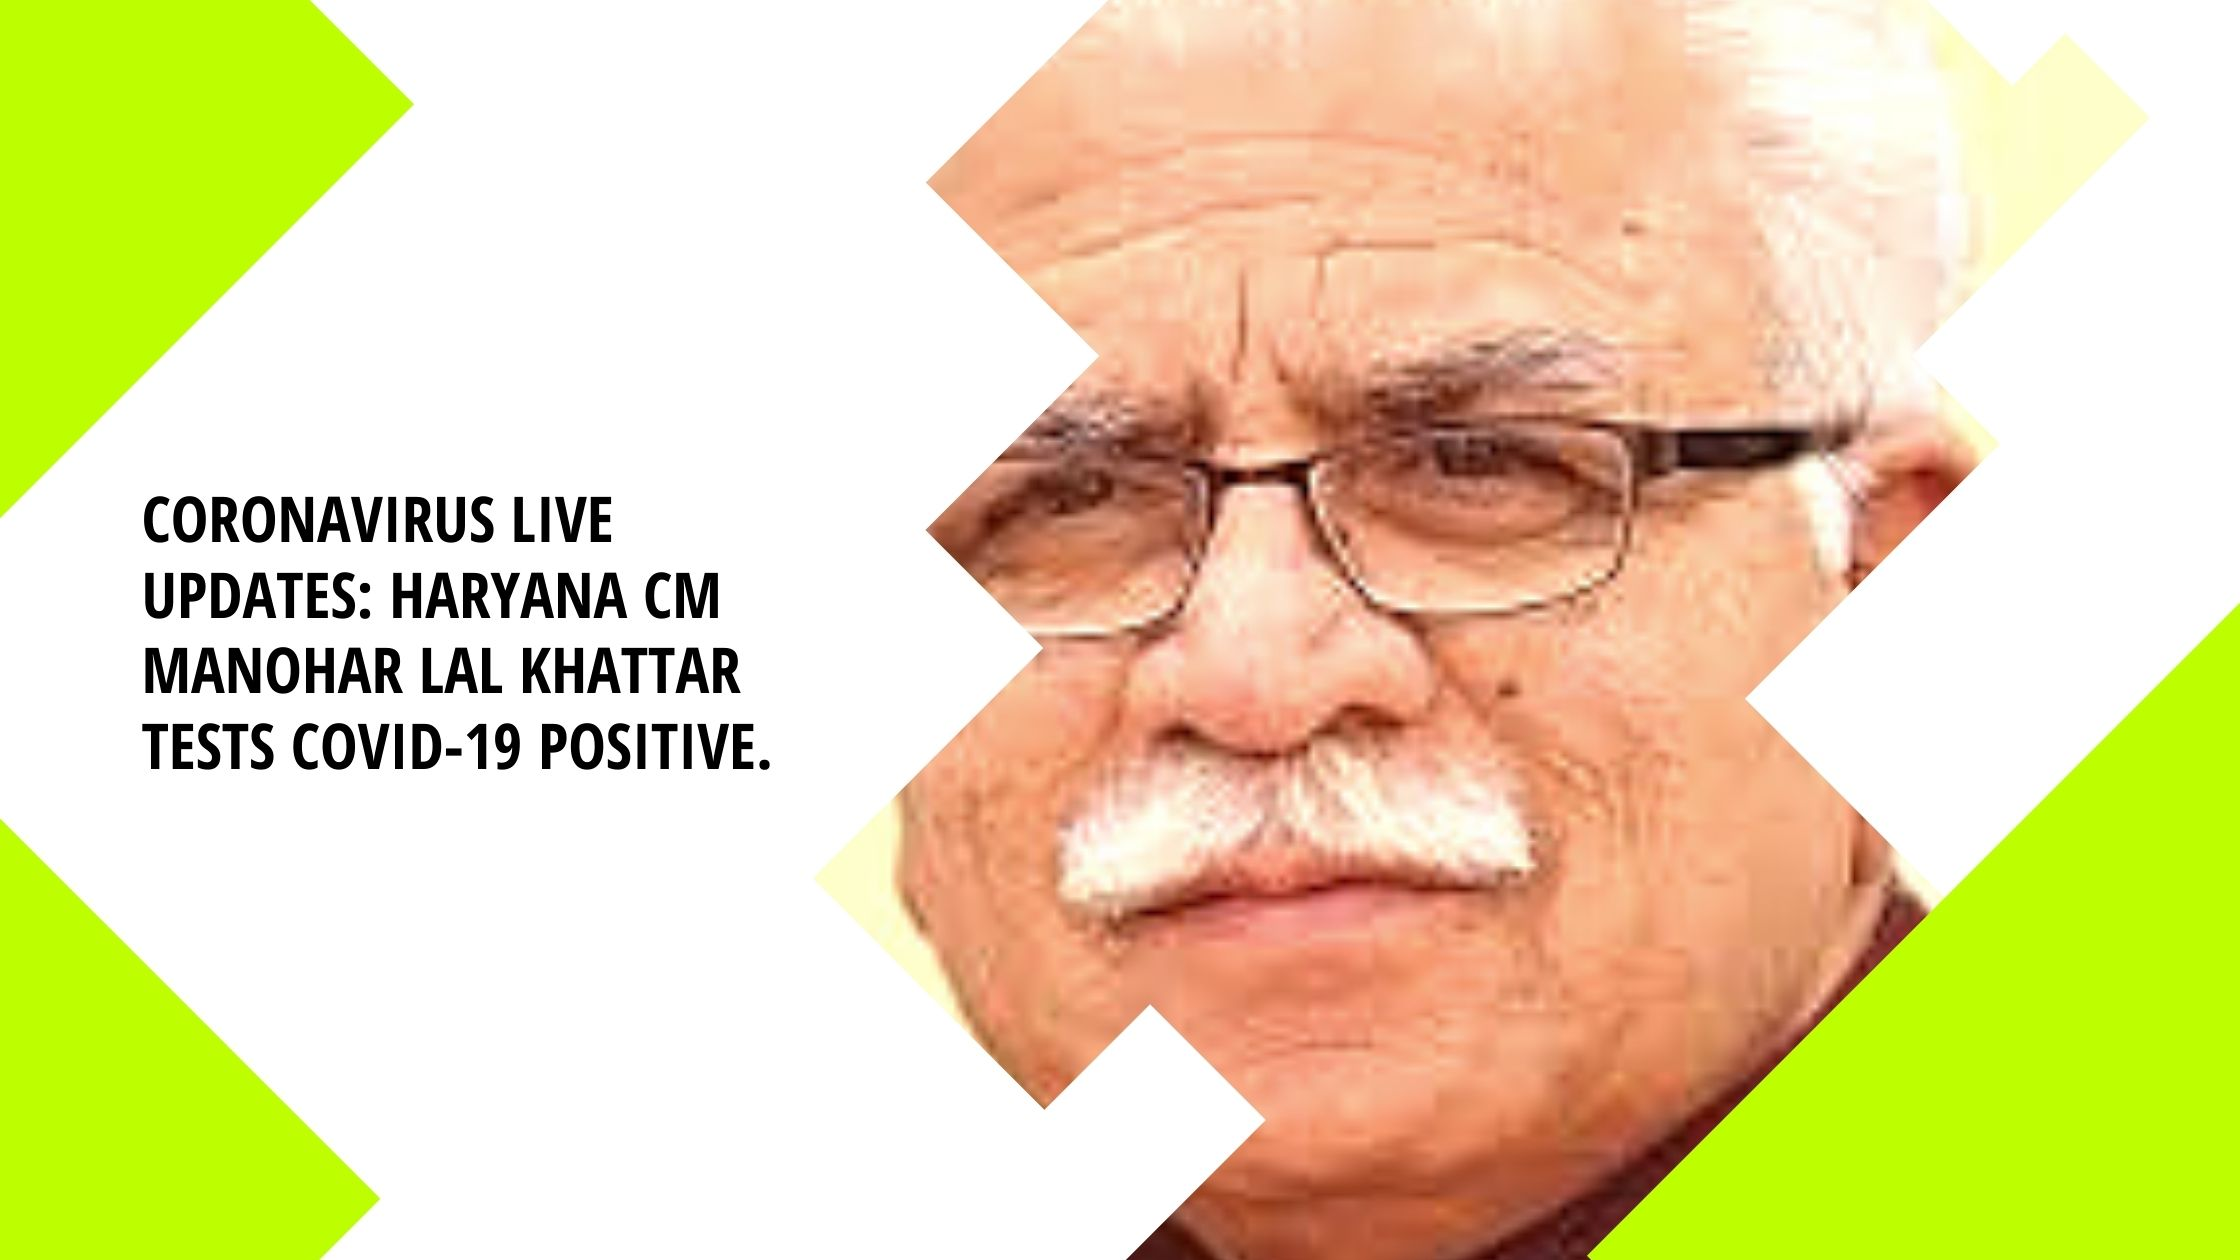 Coronavirus LIVE Updates_ Haryana CM Manohar Lal Khattar tests Covid-19 positive.